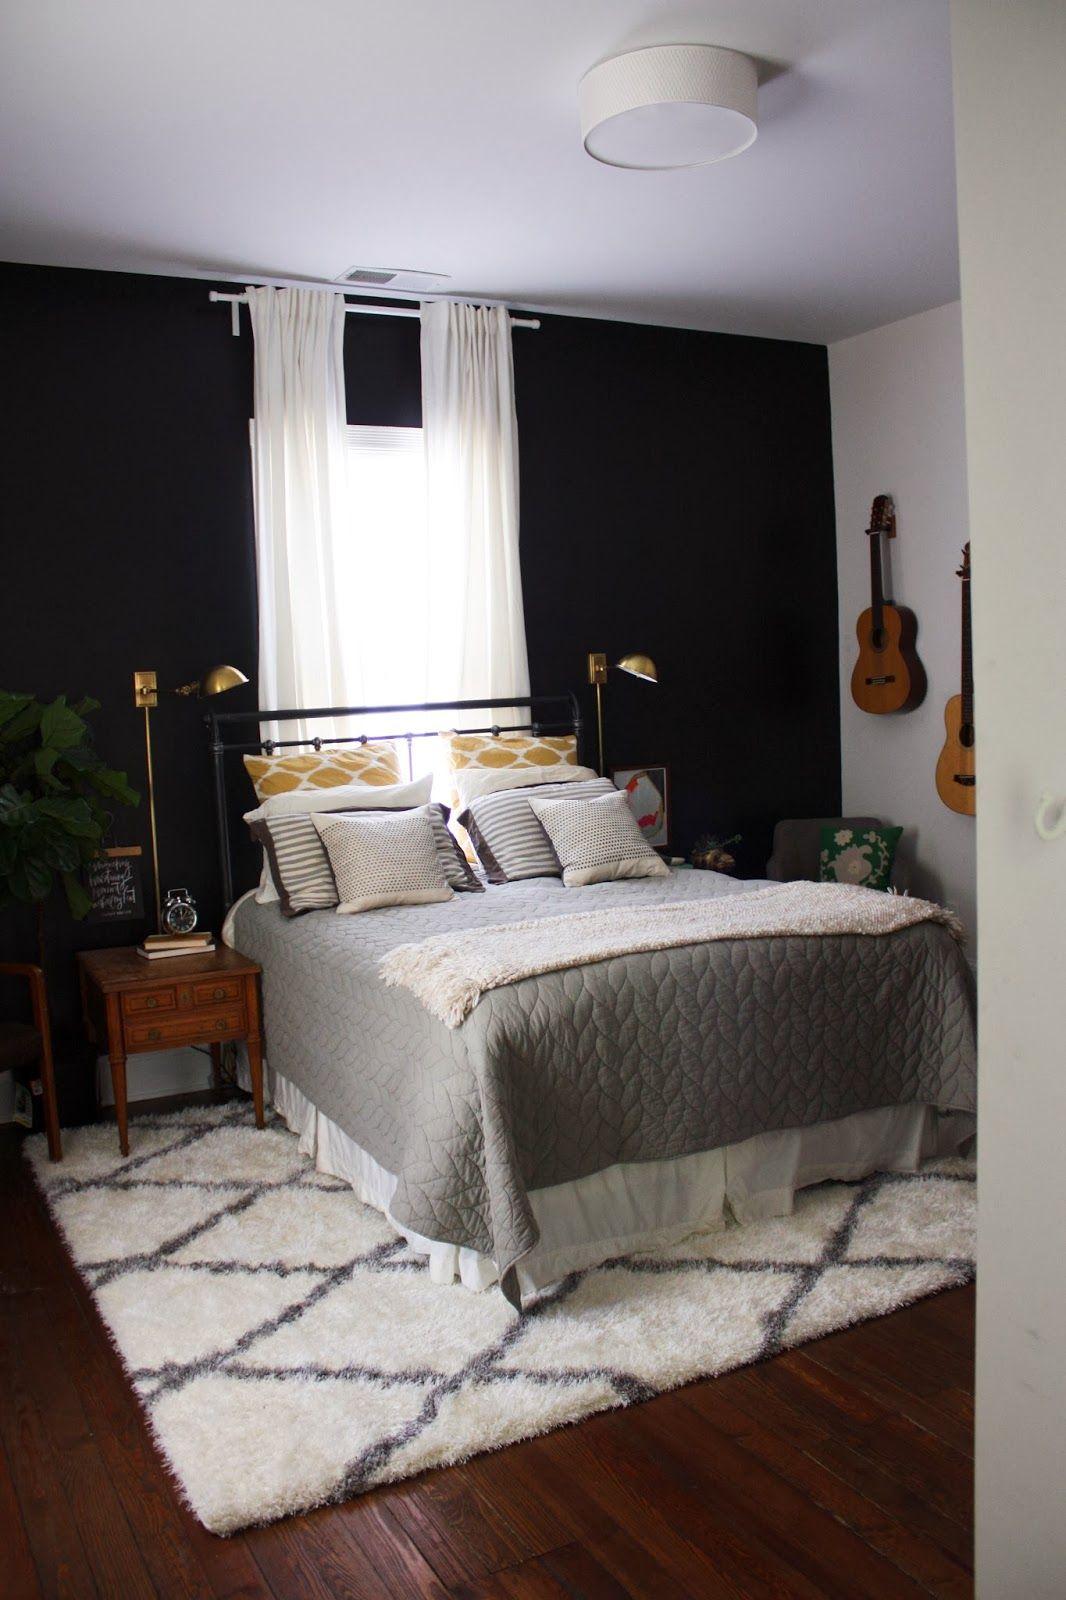 Consider Floor Length Curtains Behind Headboard In Master